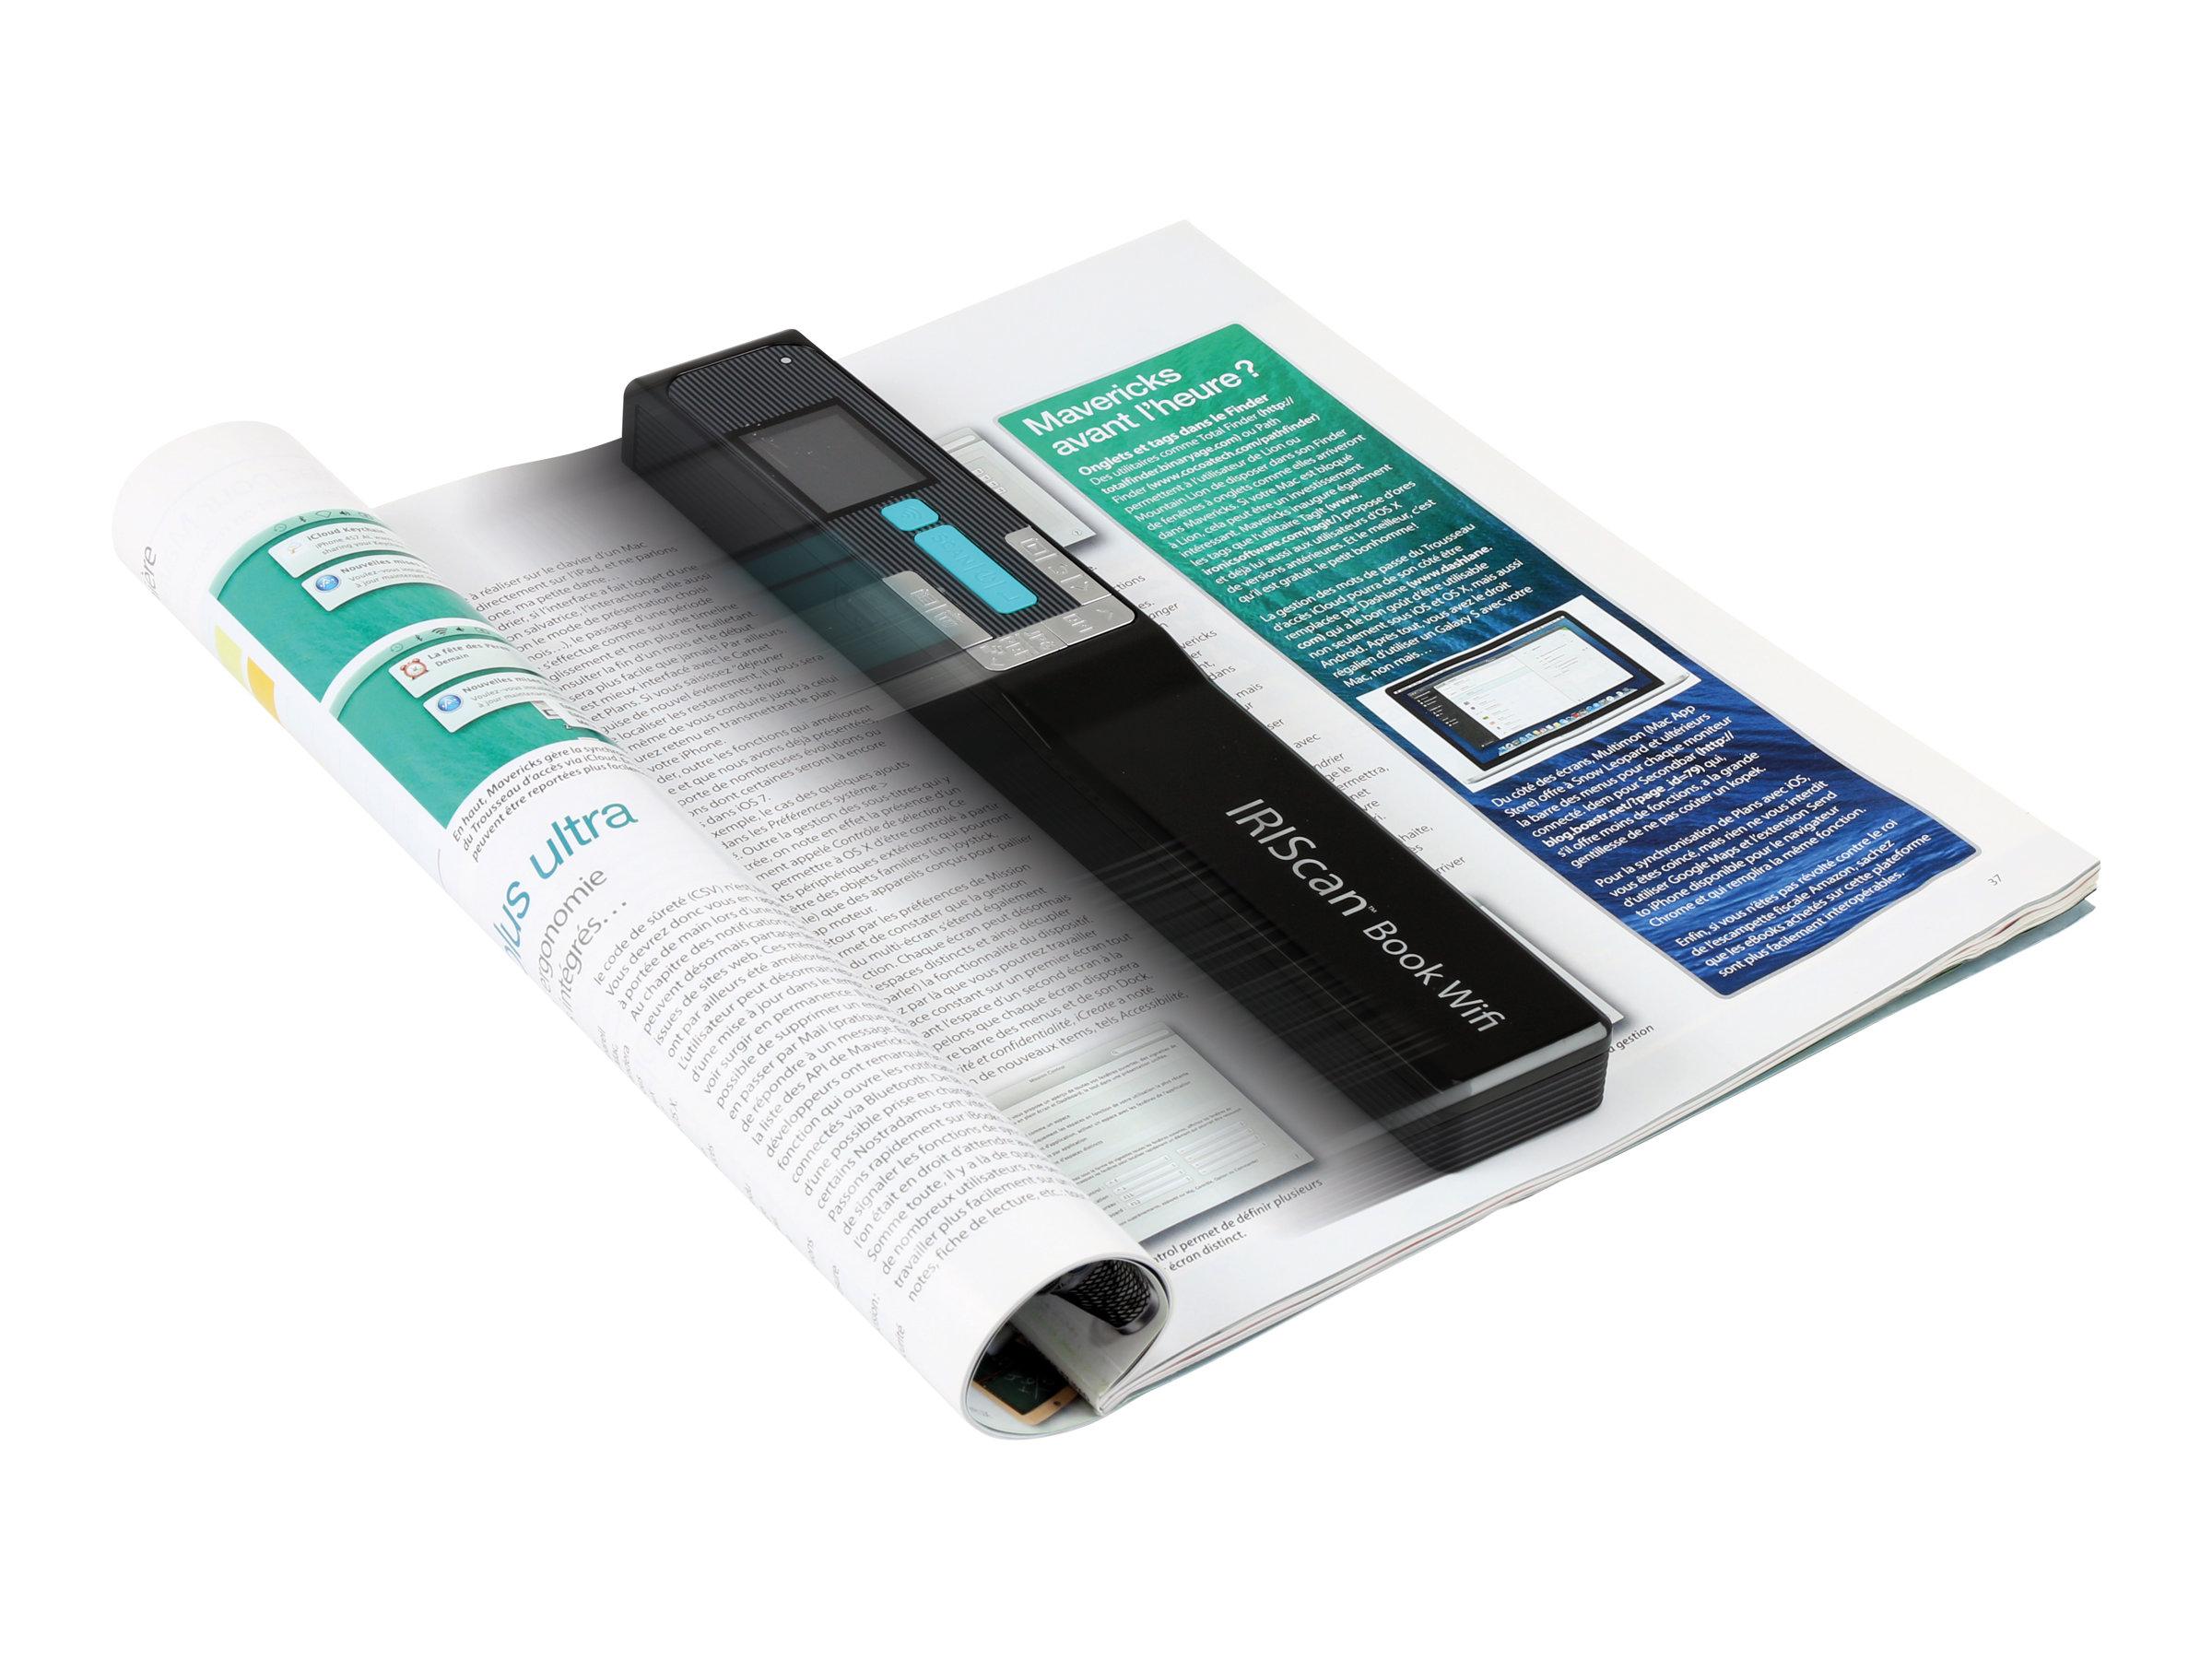 IRIS IRIScan Book 5 Wifi - Scanner als Handgerät - Contact Image Sensor (CIS) - A4 - 1200 dpi - USB, Wi-Fi